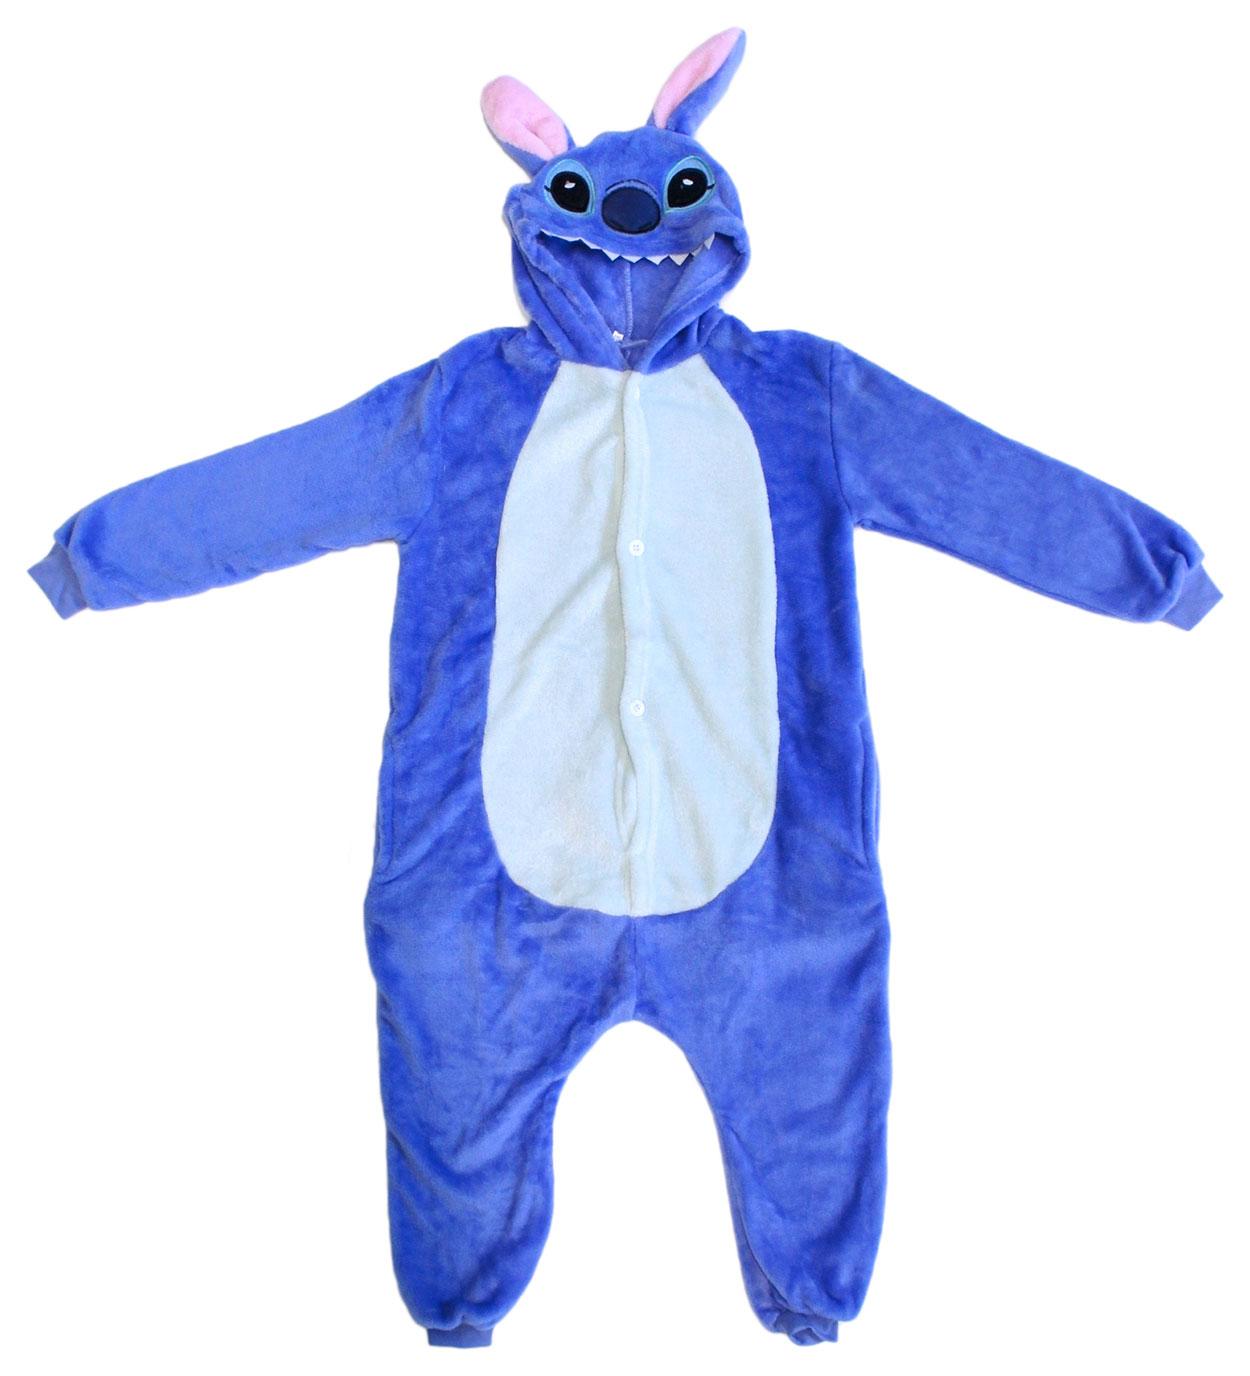 Пижама-кигуруми Lilkrok Синий Стич 106-115 см фото